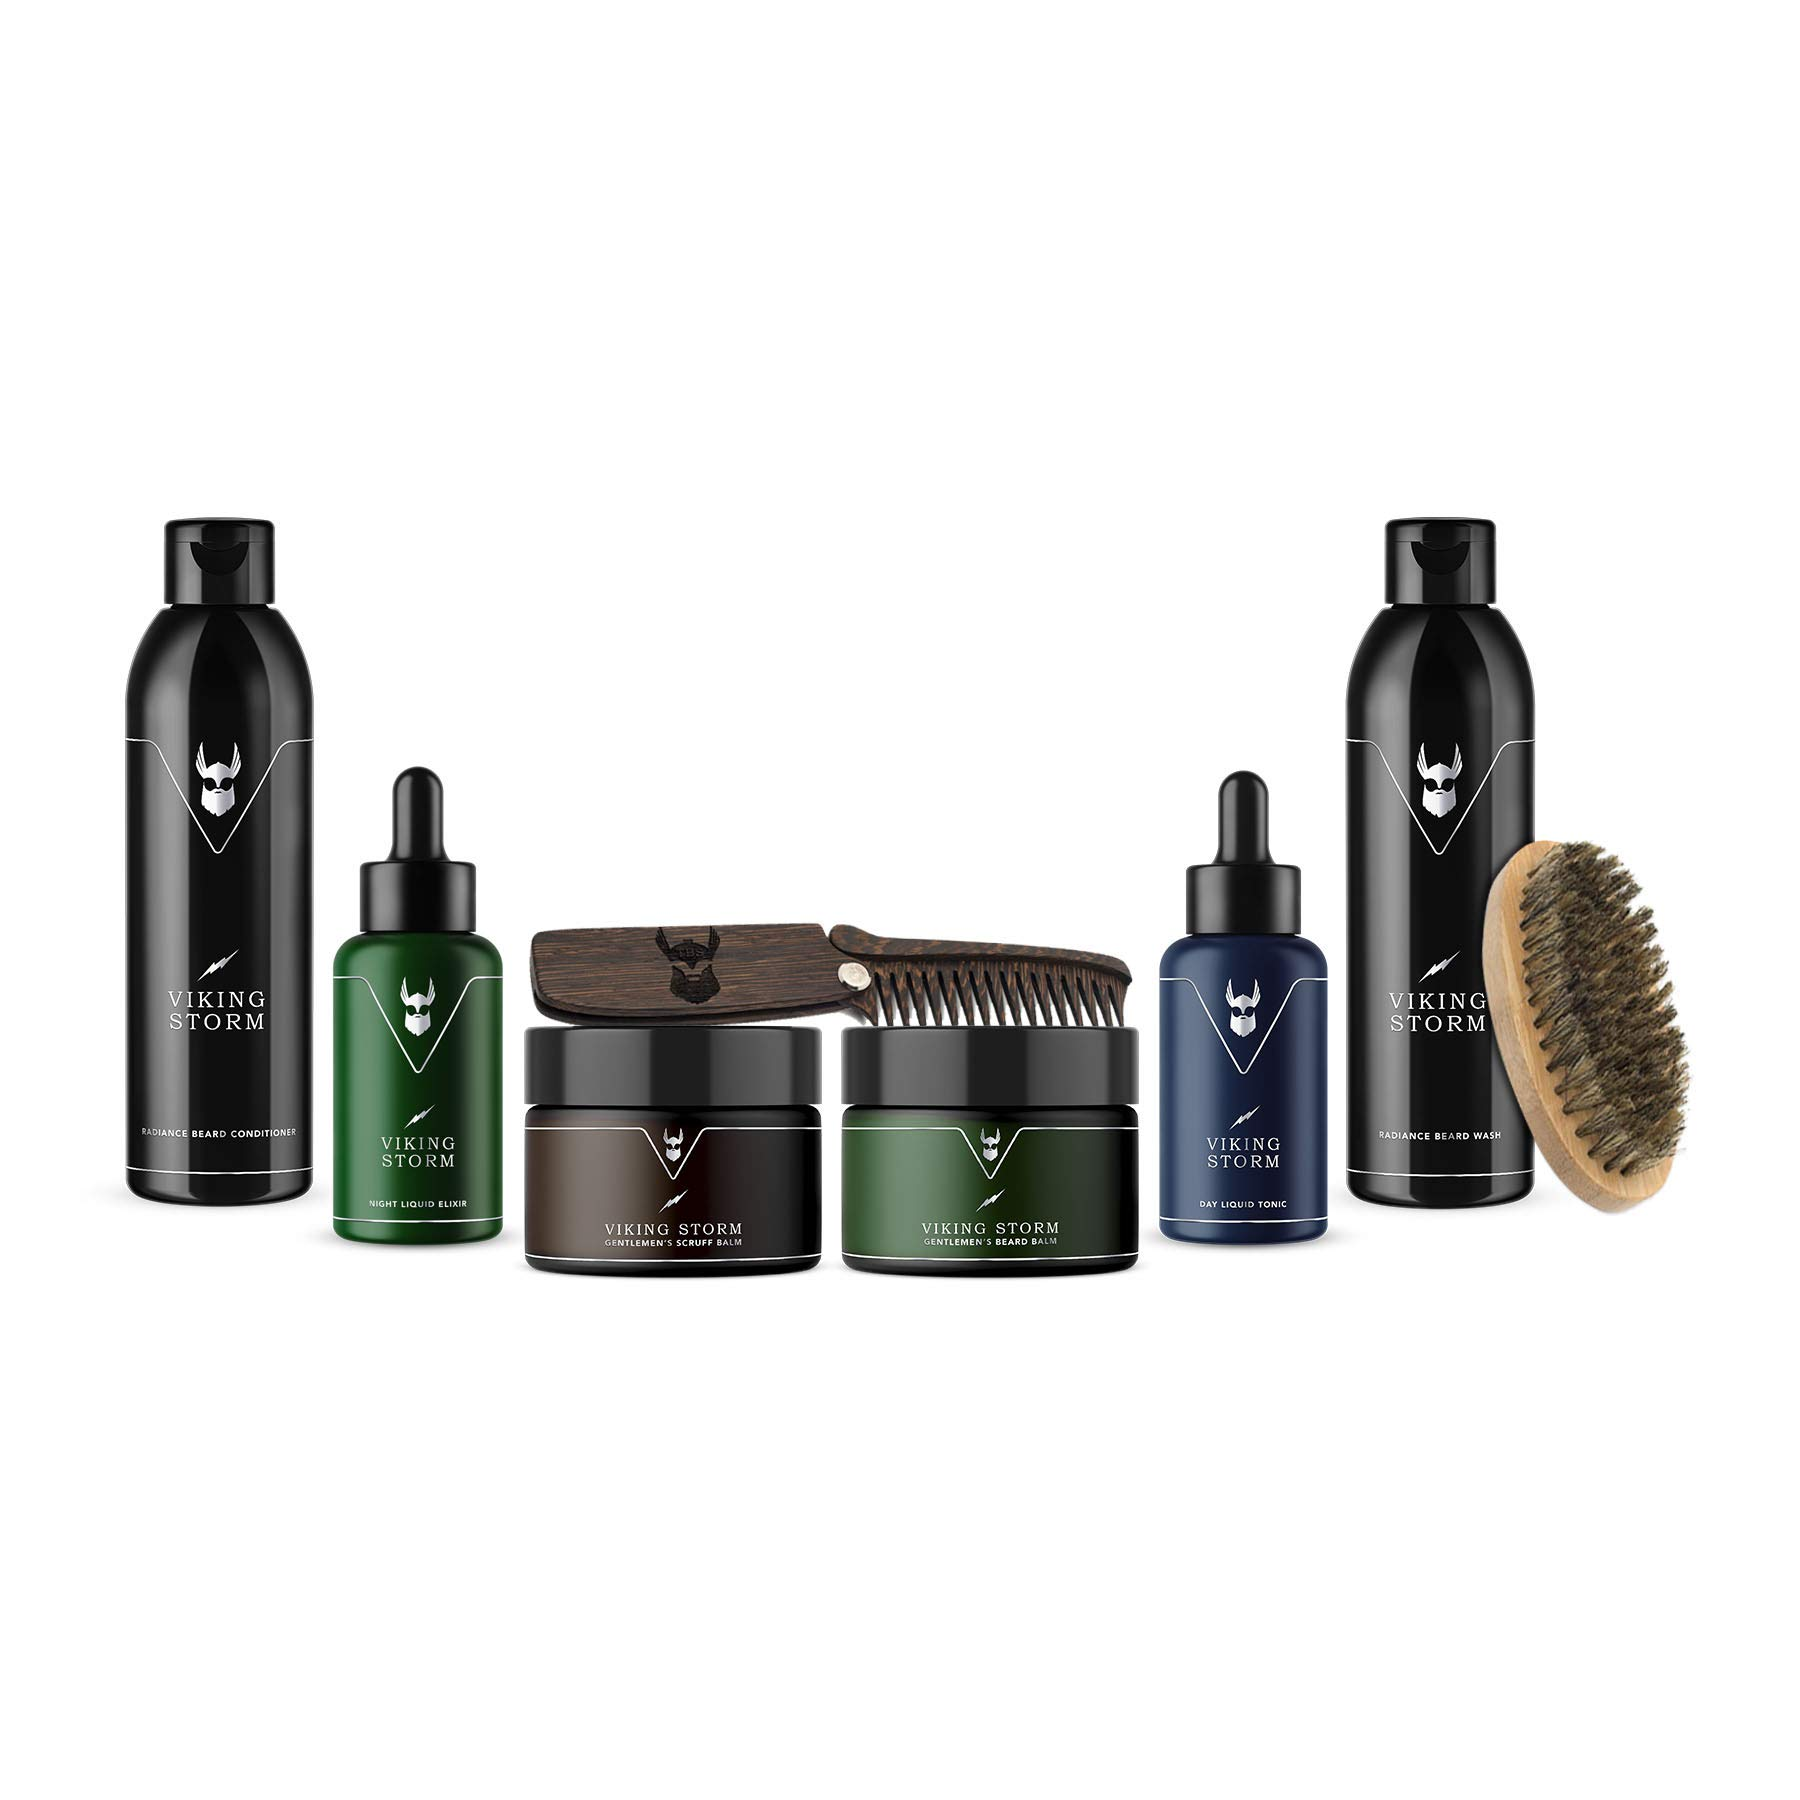 The Beard Struggle Ultimate Kit Viking Storm for Men & Beard Care W/Beard Wash/Shampoo/Conditioner/Night oil/Day oil,100% Natural & Organic